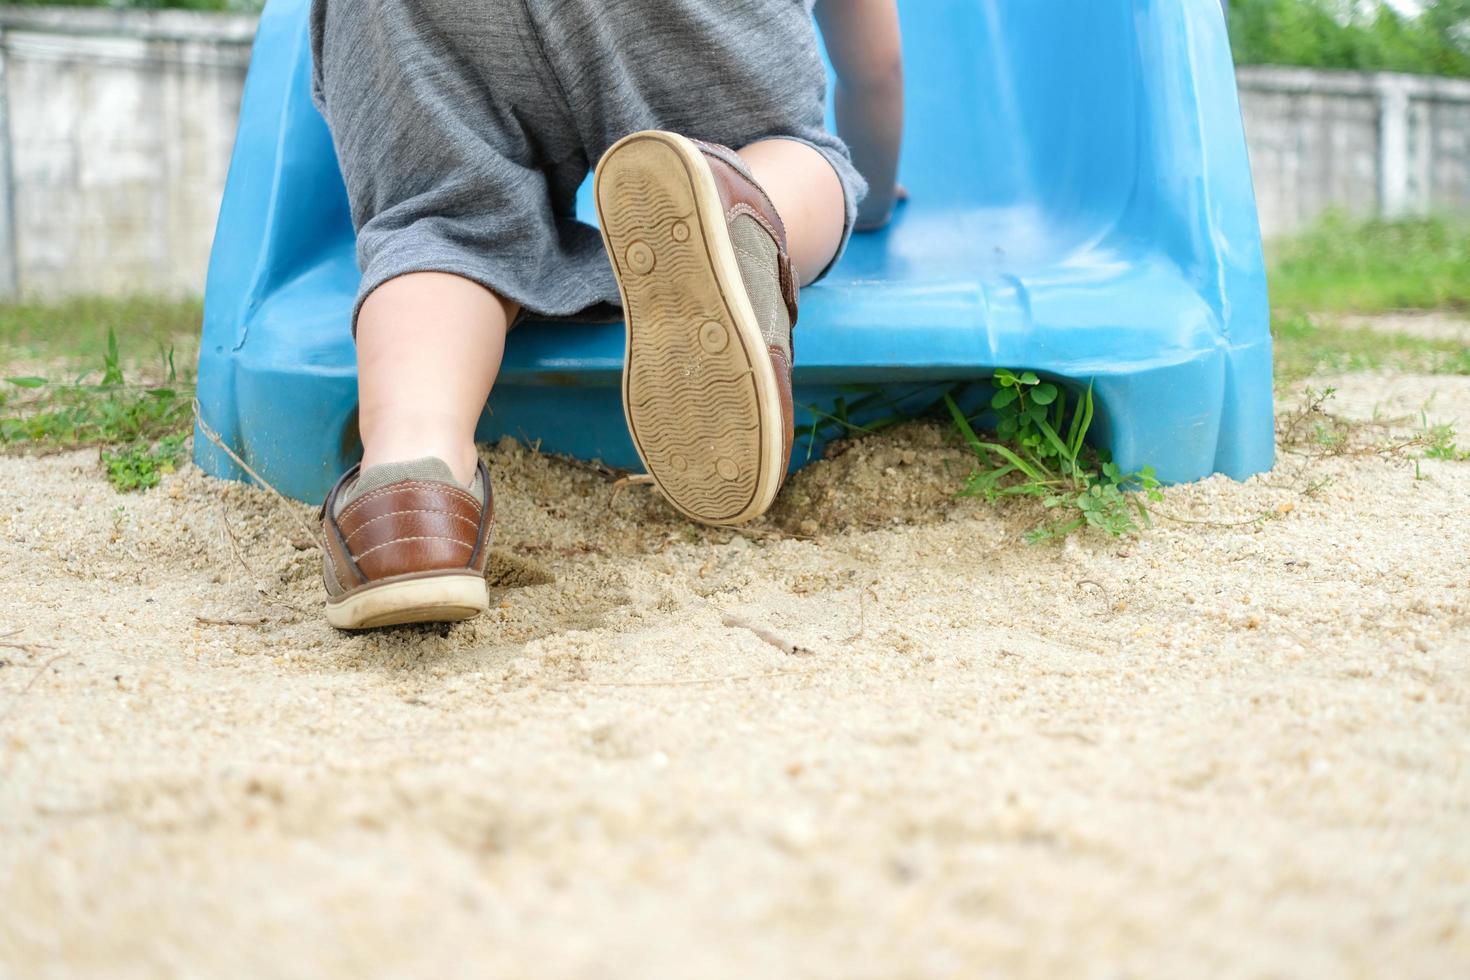 Little kid climbing up playground slide photo